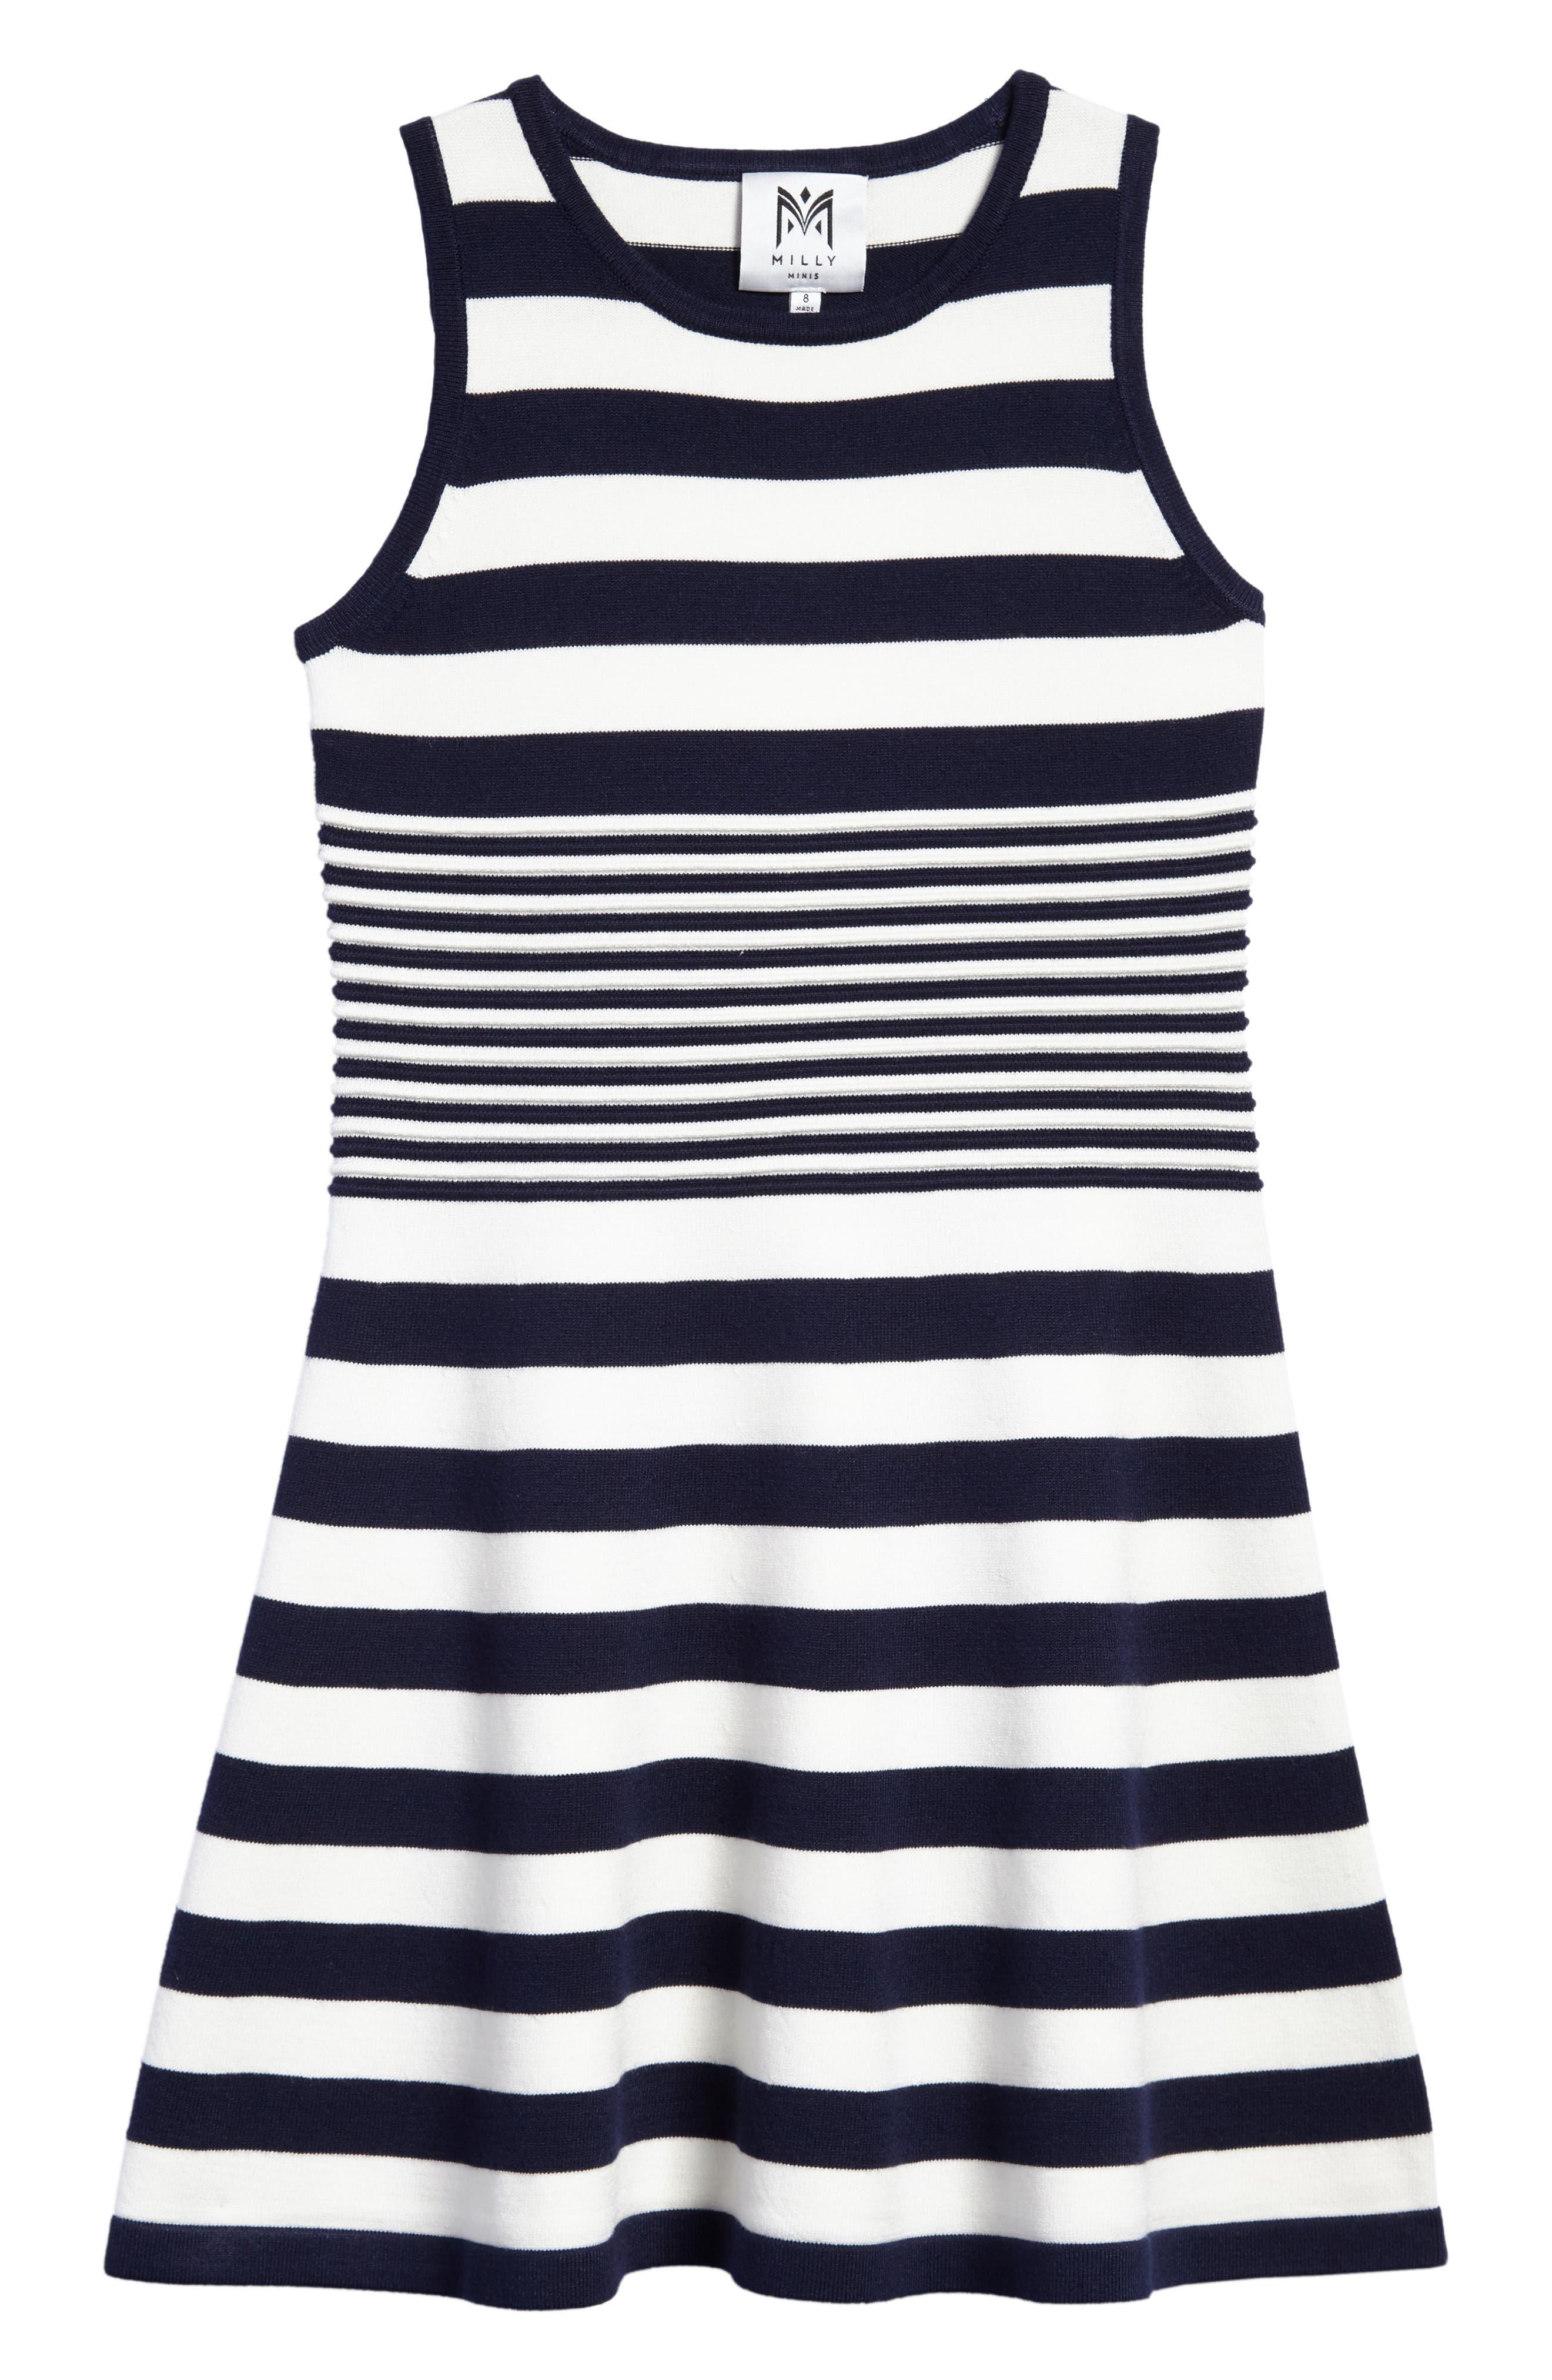 Stripe Sleeveless Dress,                             Main thumbnail 1, color,                             155